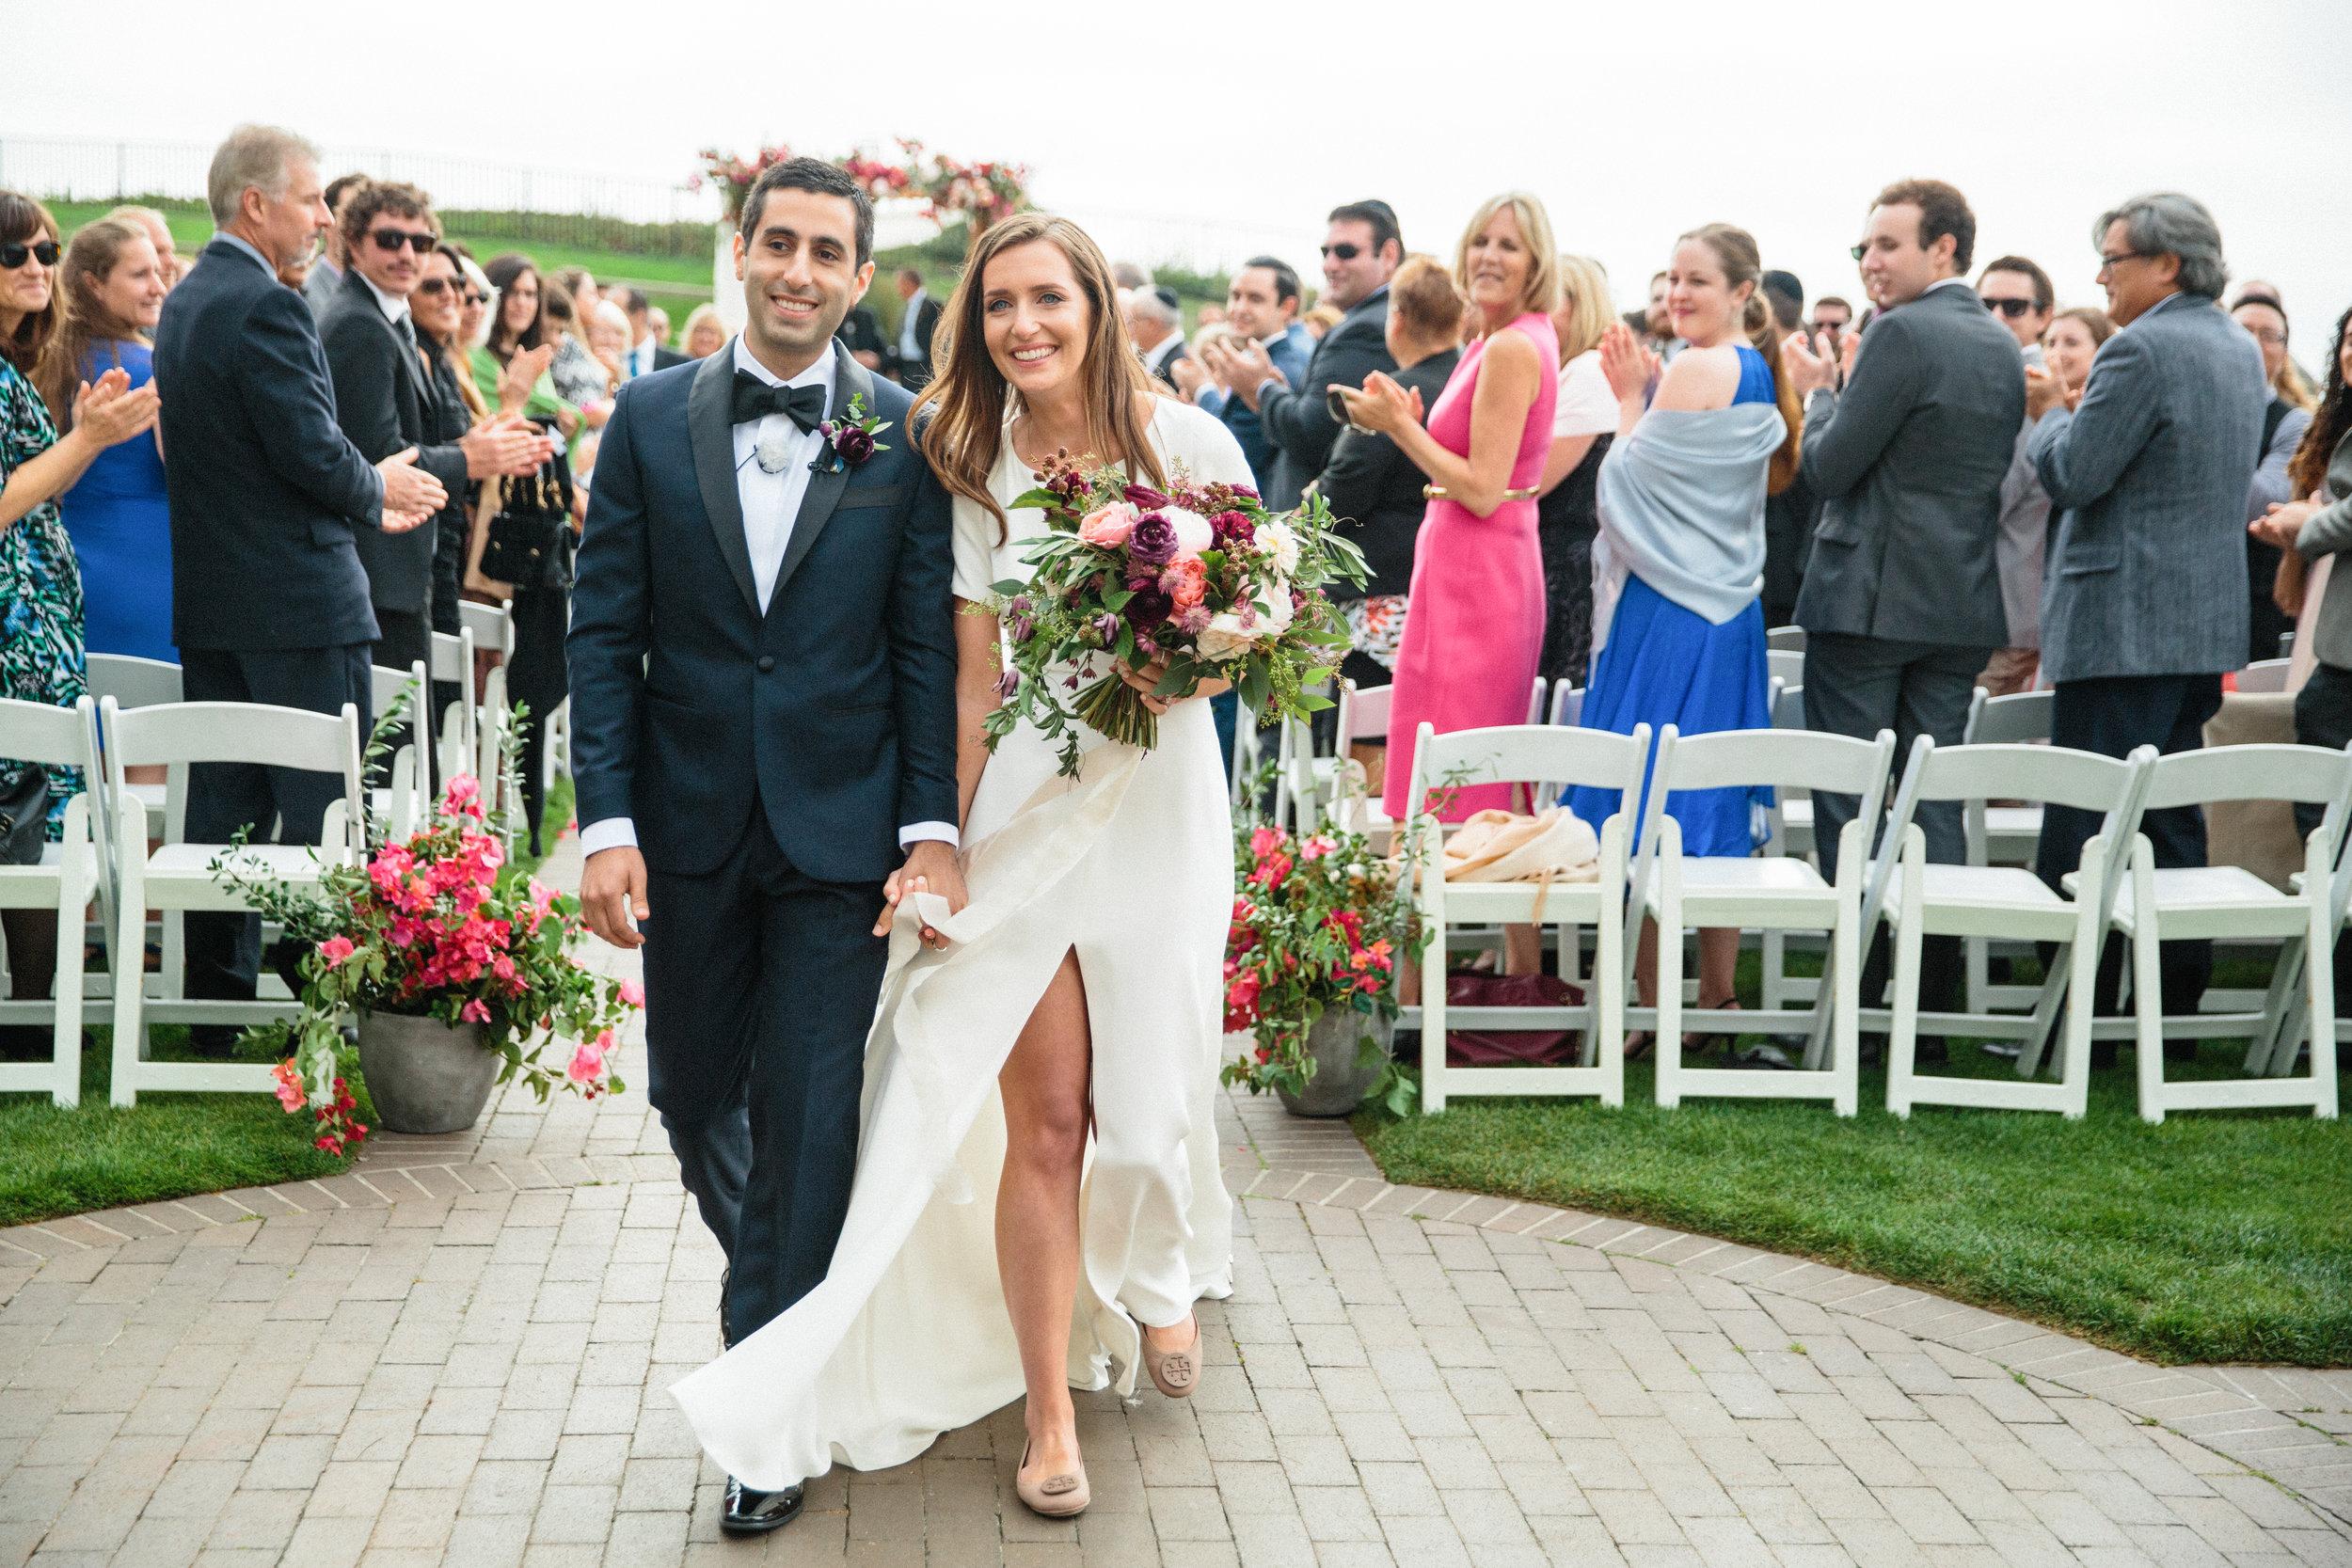 larissa-cleveland-sivanjeremy-wedding-0659-2.jpg